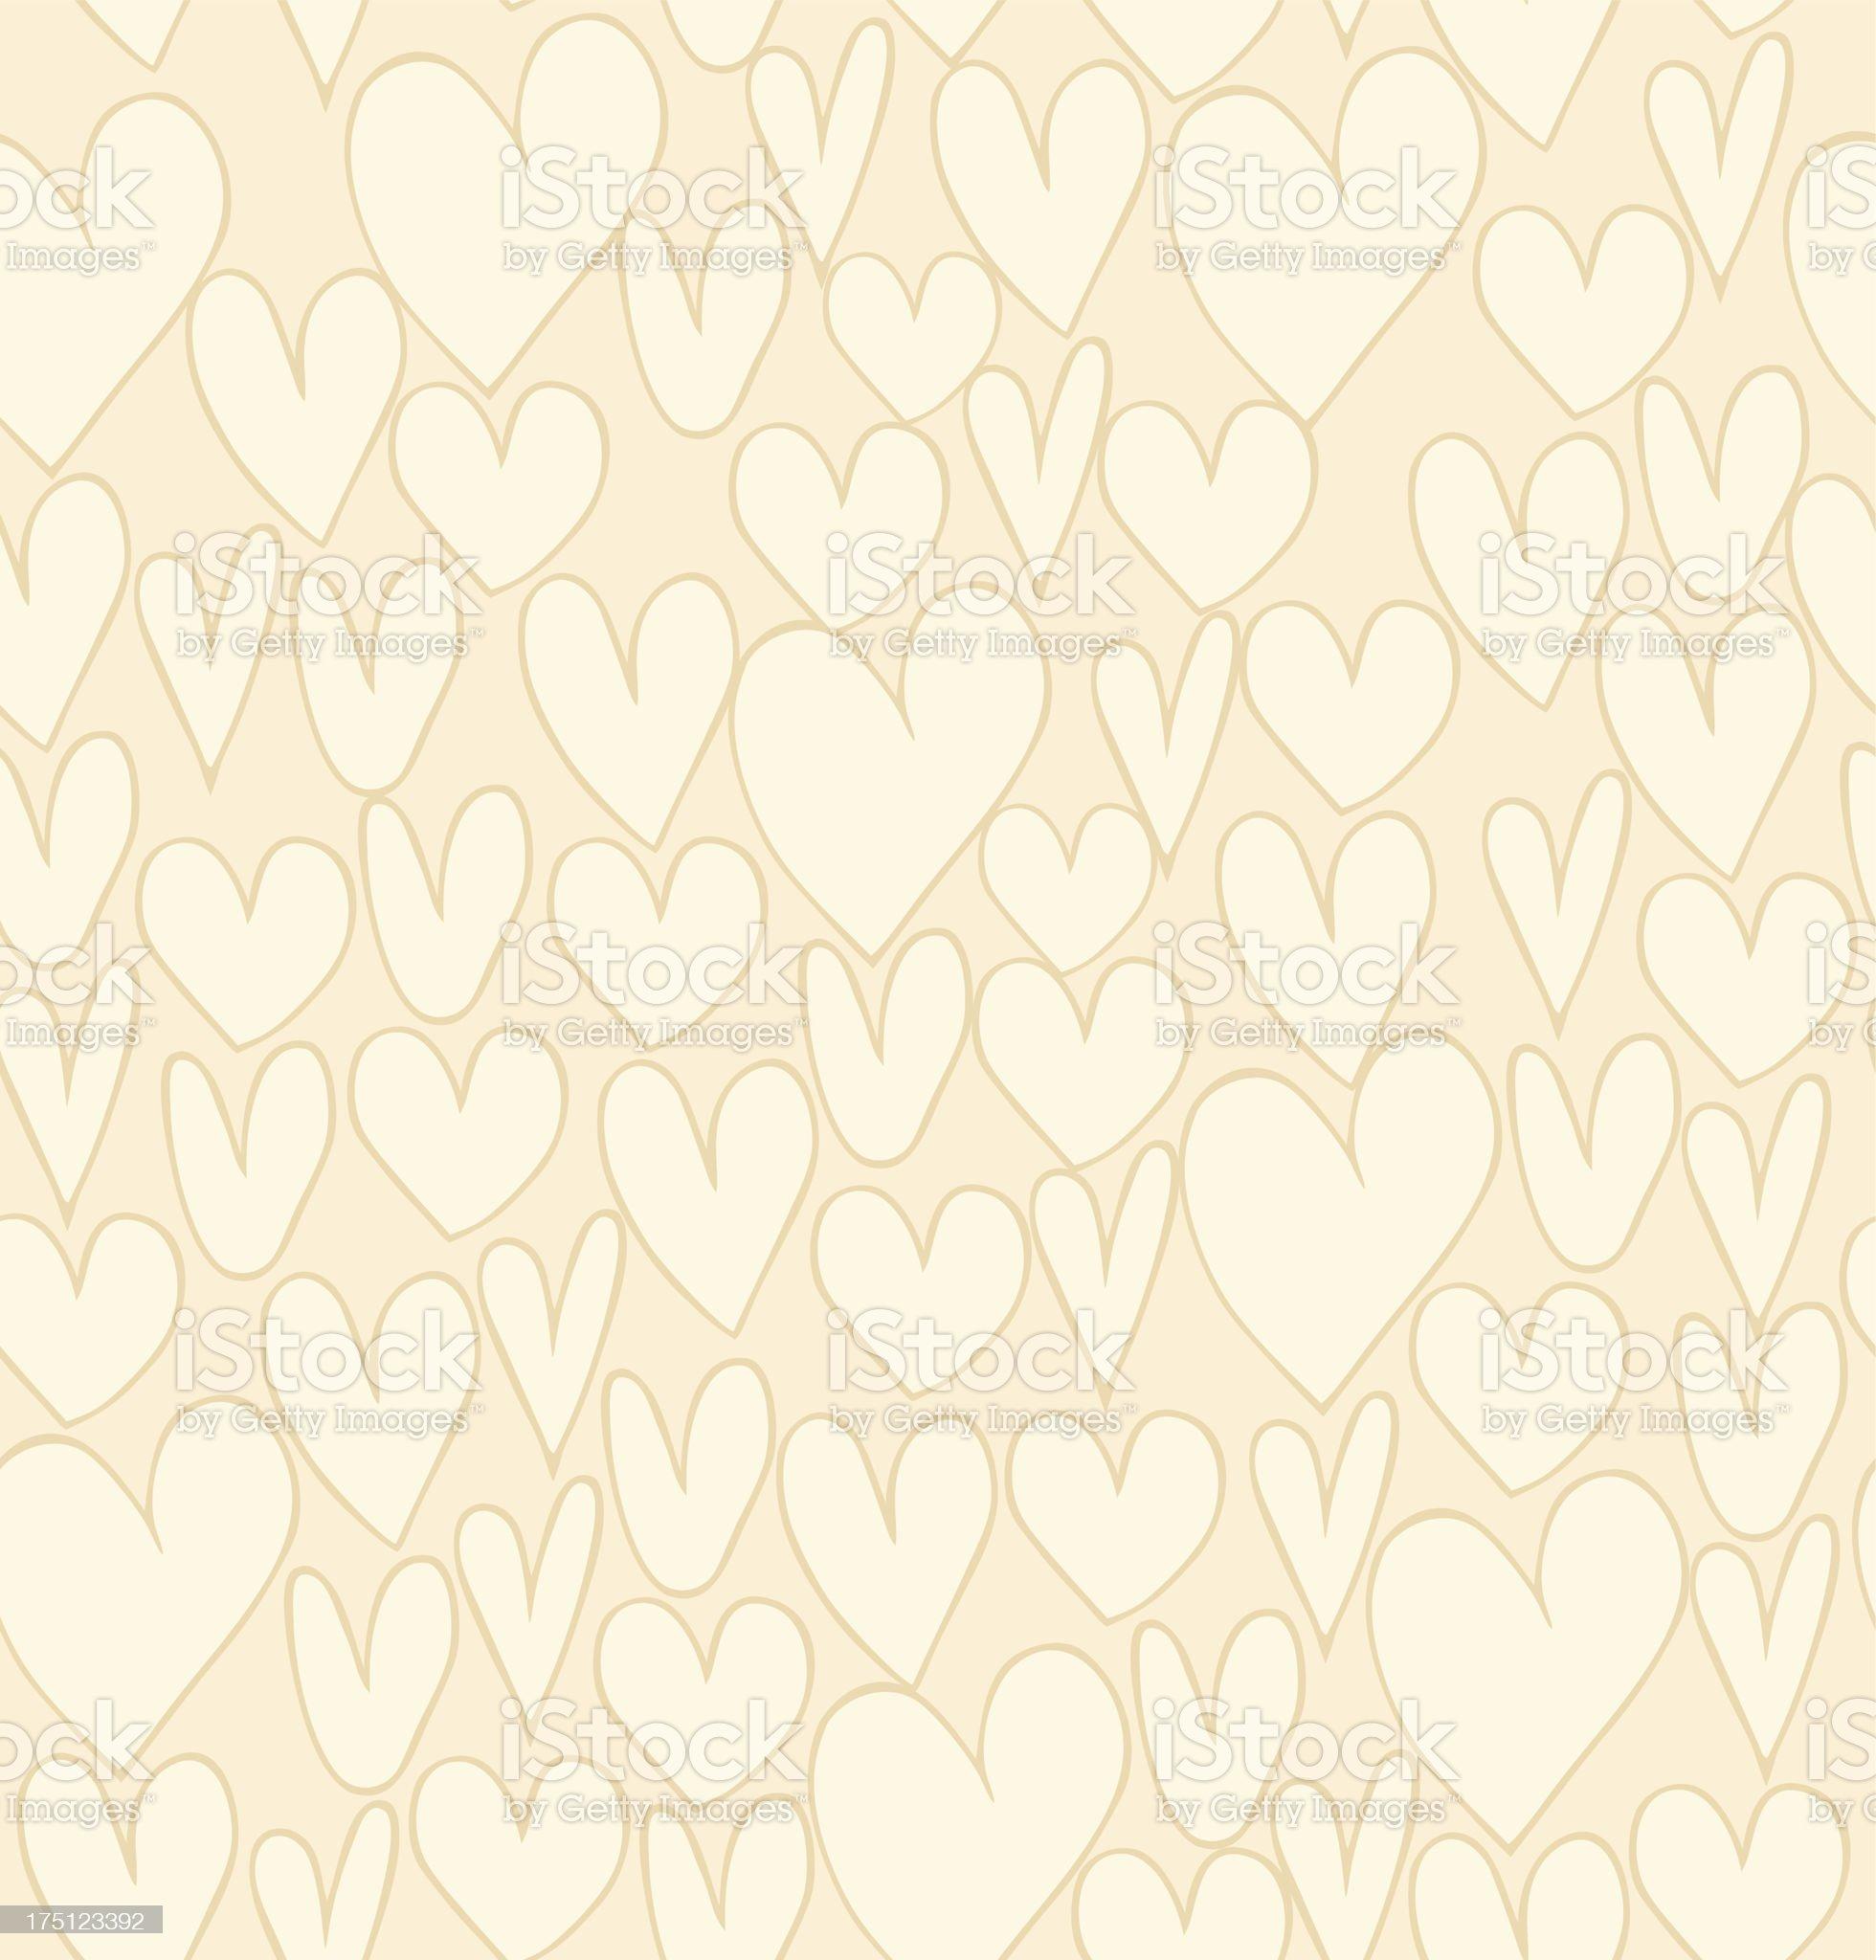 Seamless light love pattern royalty-free stock vector art